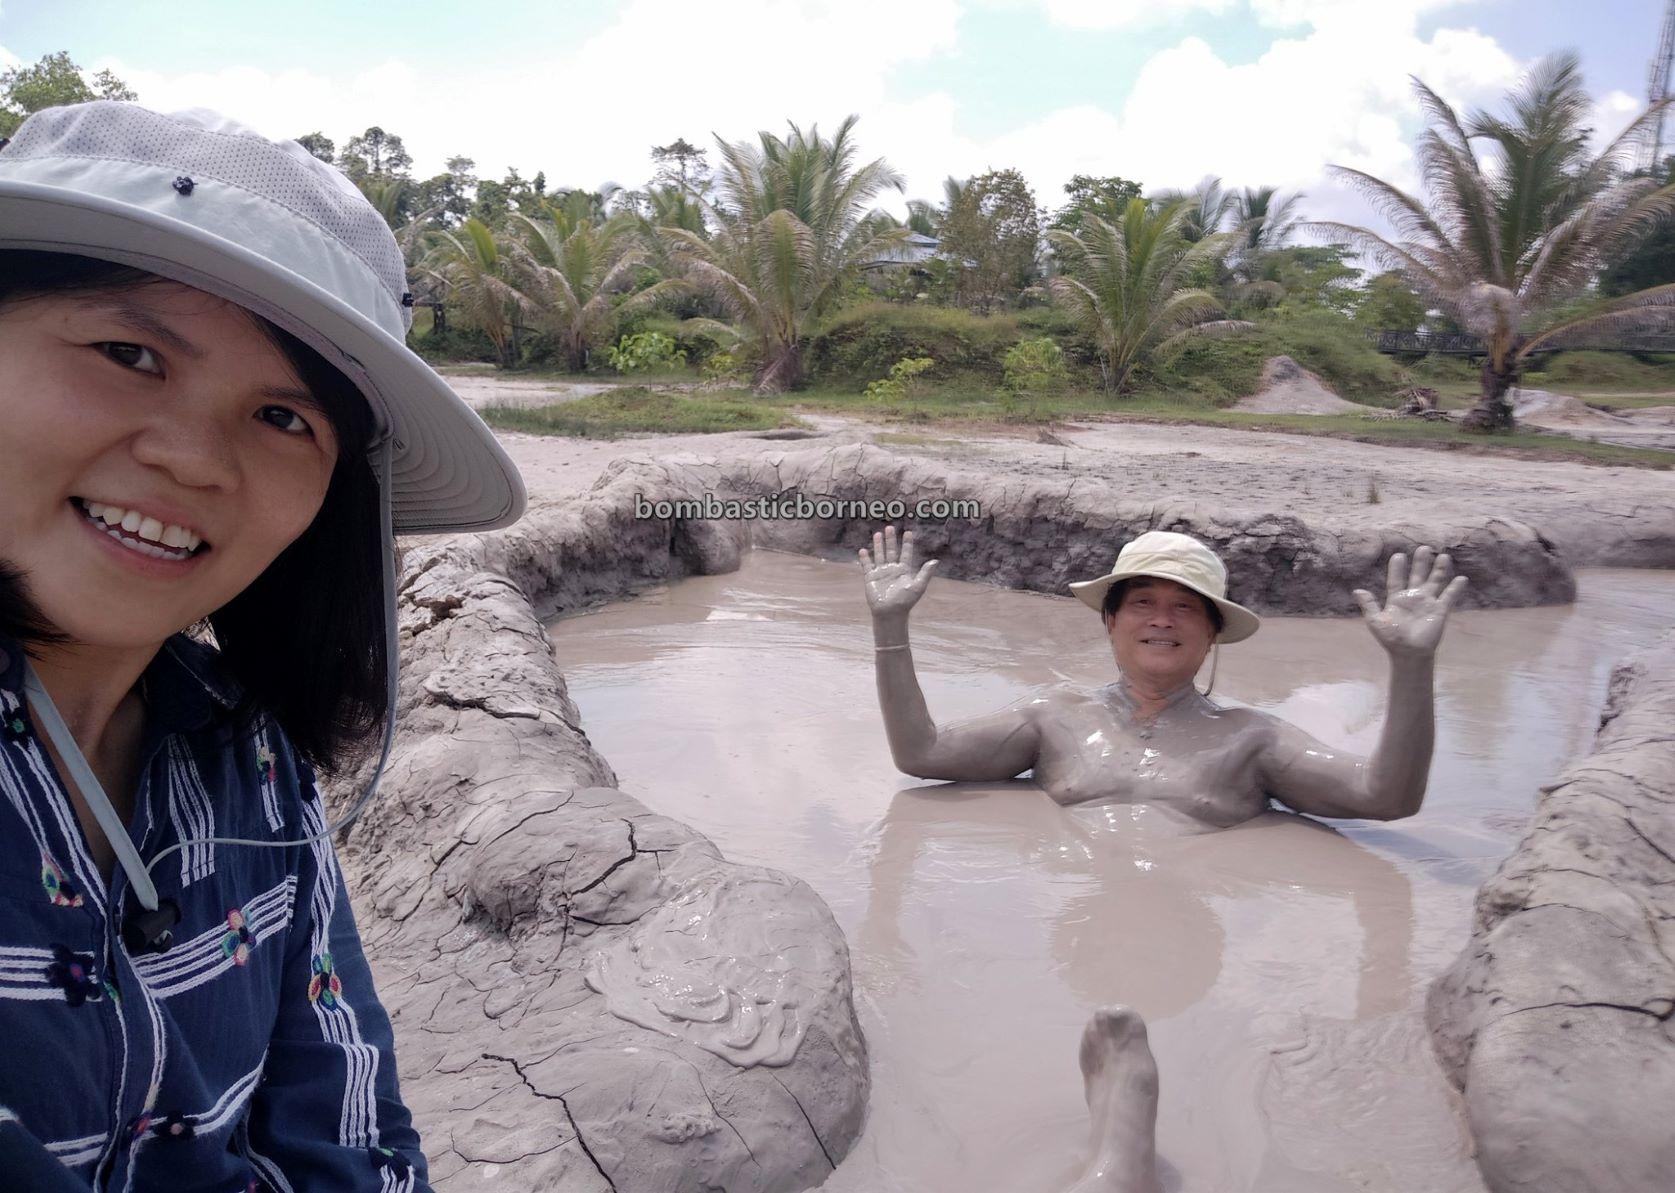 Lumpur Bebuak, Mud Volcano, Mud Pools, Spa, Kampung Meritam, adventure, nature, outdoor, Limbang, Sarawak, Malaysia, Tourism, tourist attraction, travel guide, Borneo,